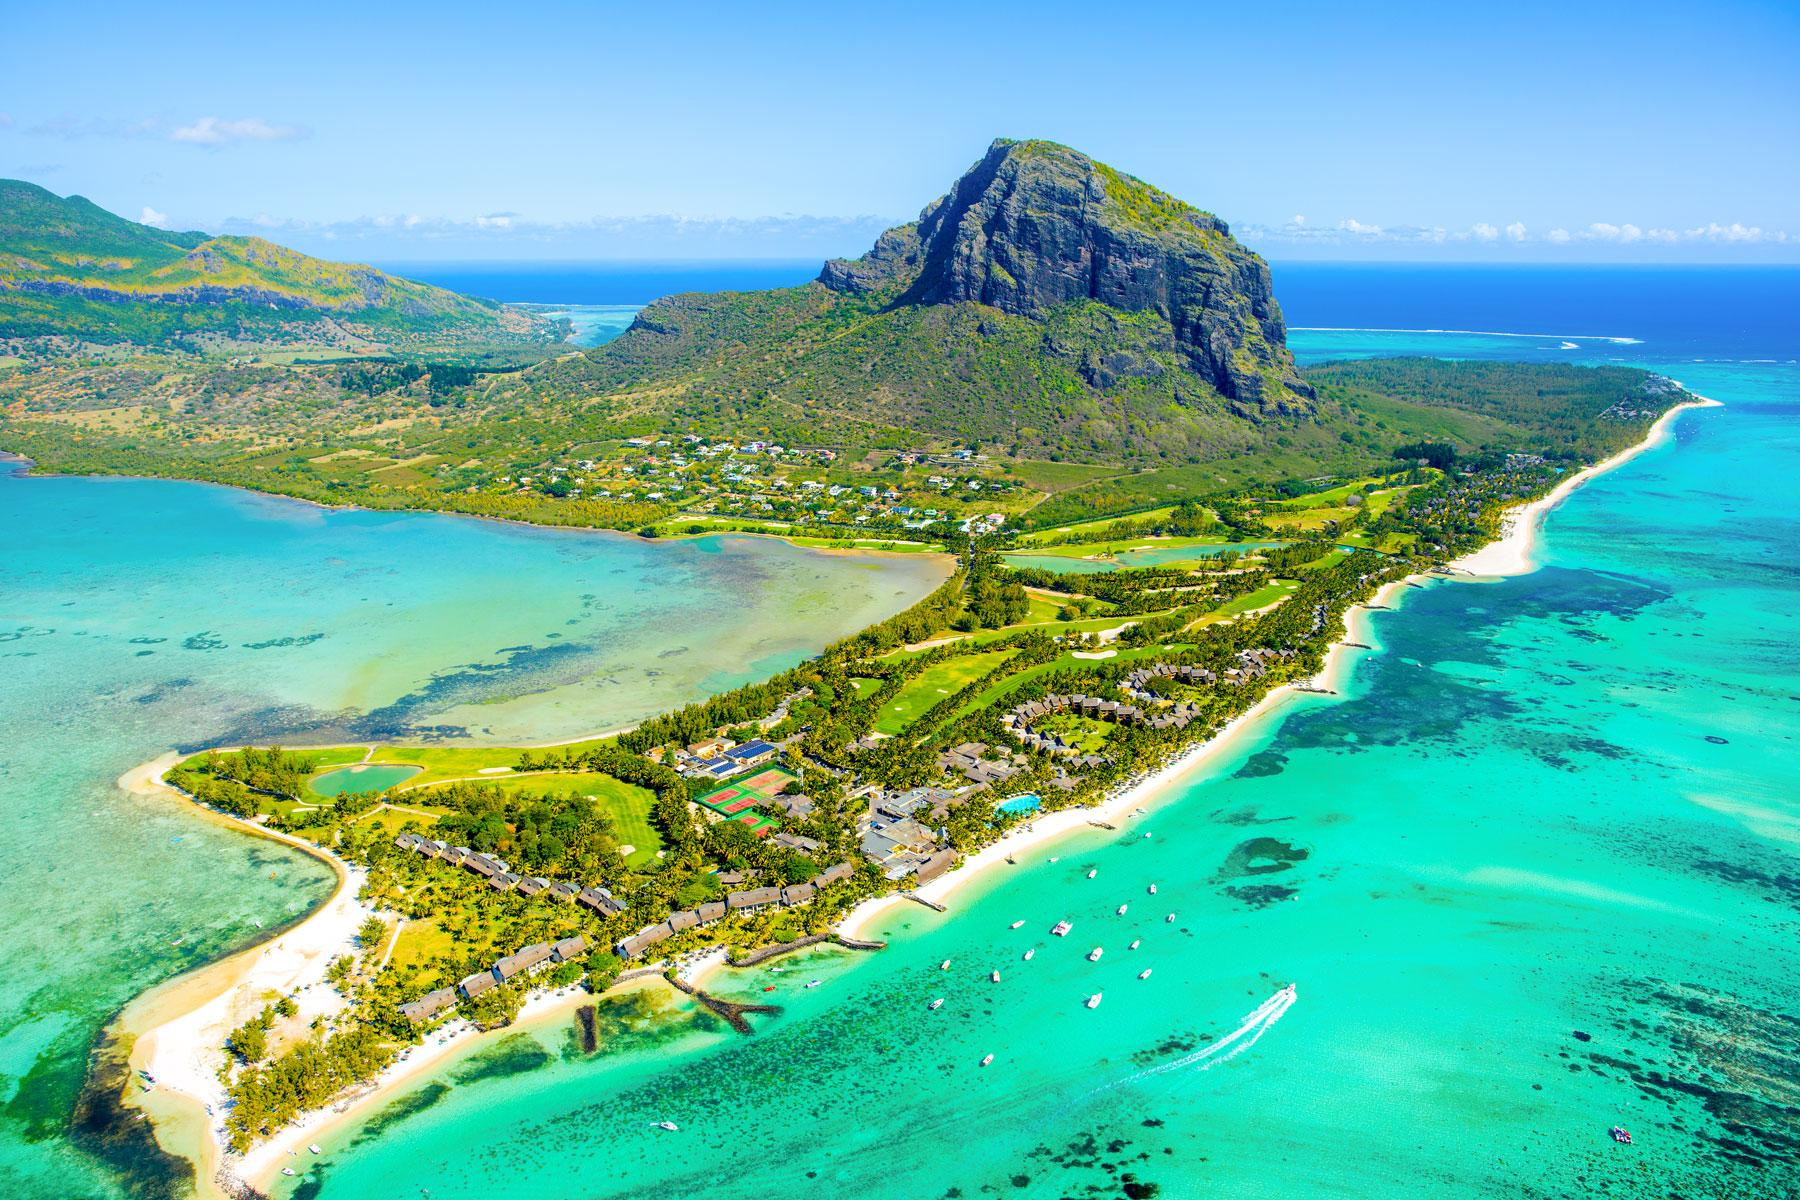 mauritius - photo #16